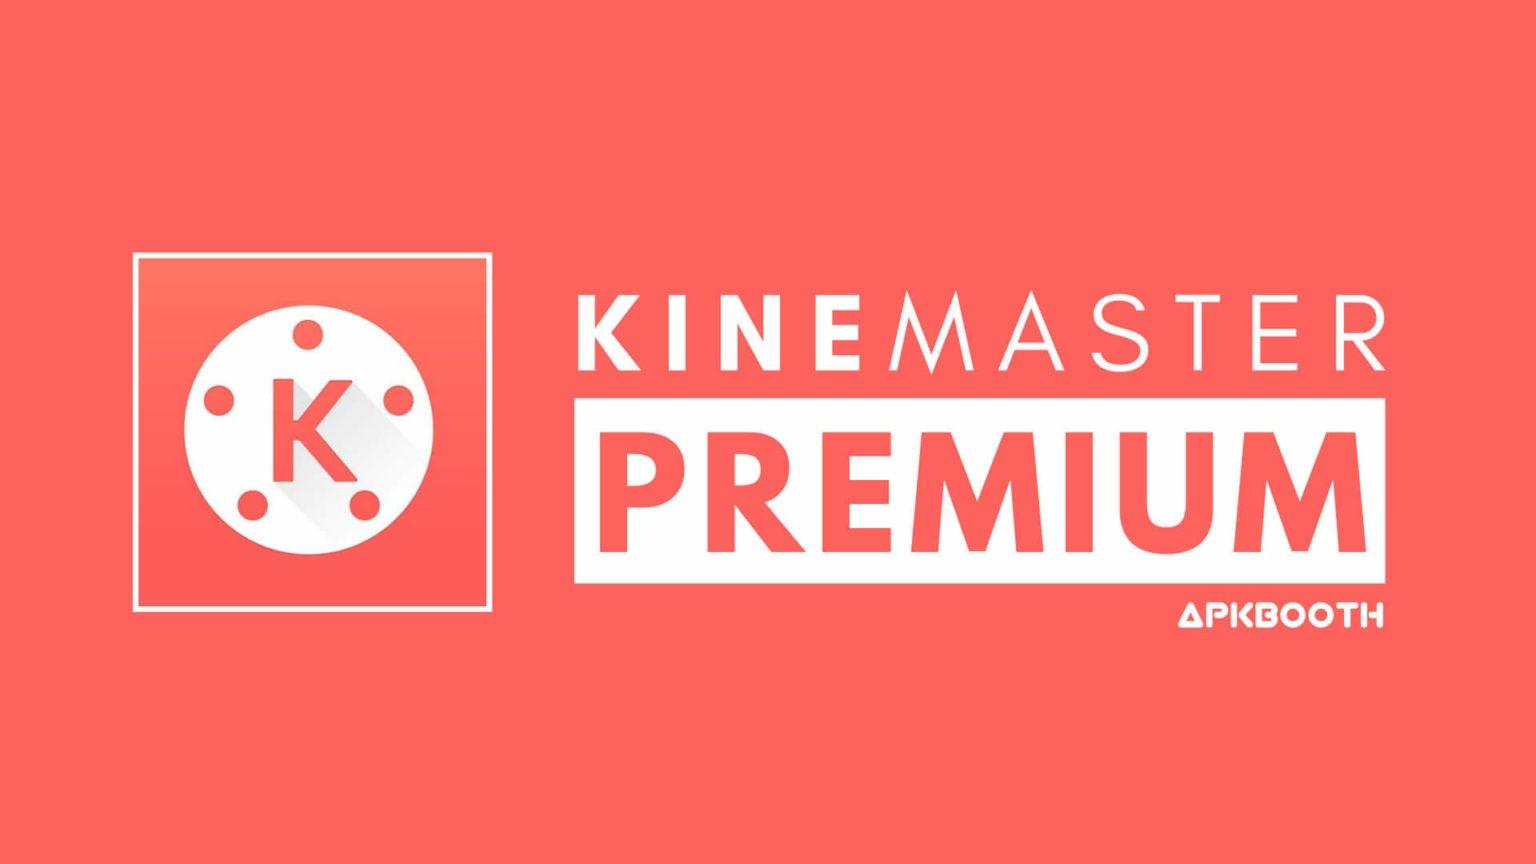 Kinemaster Pro Mod+ No Watermark Apk